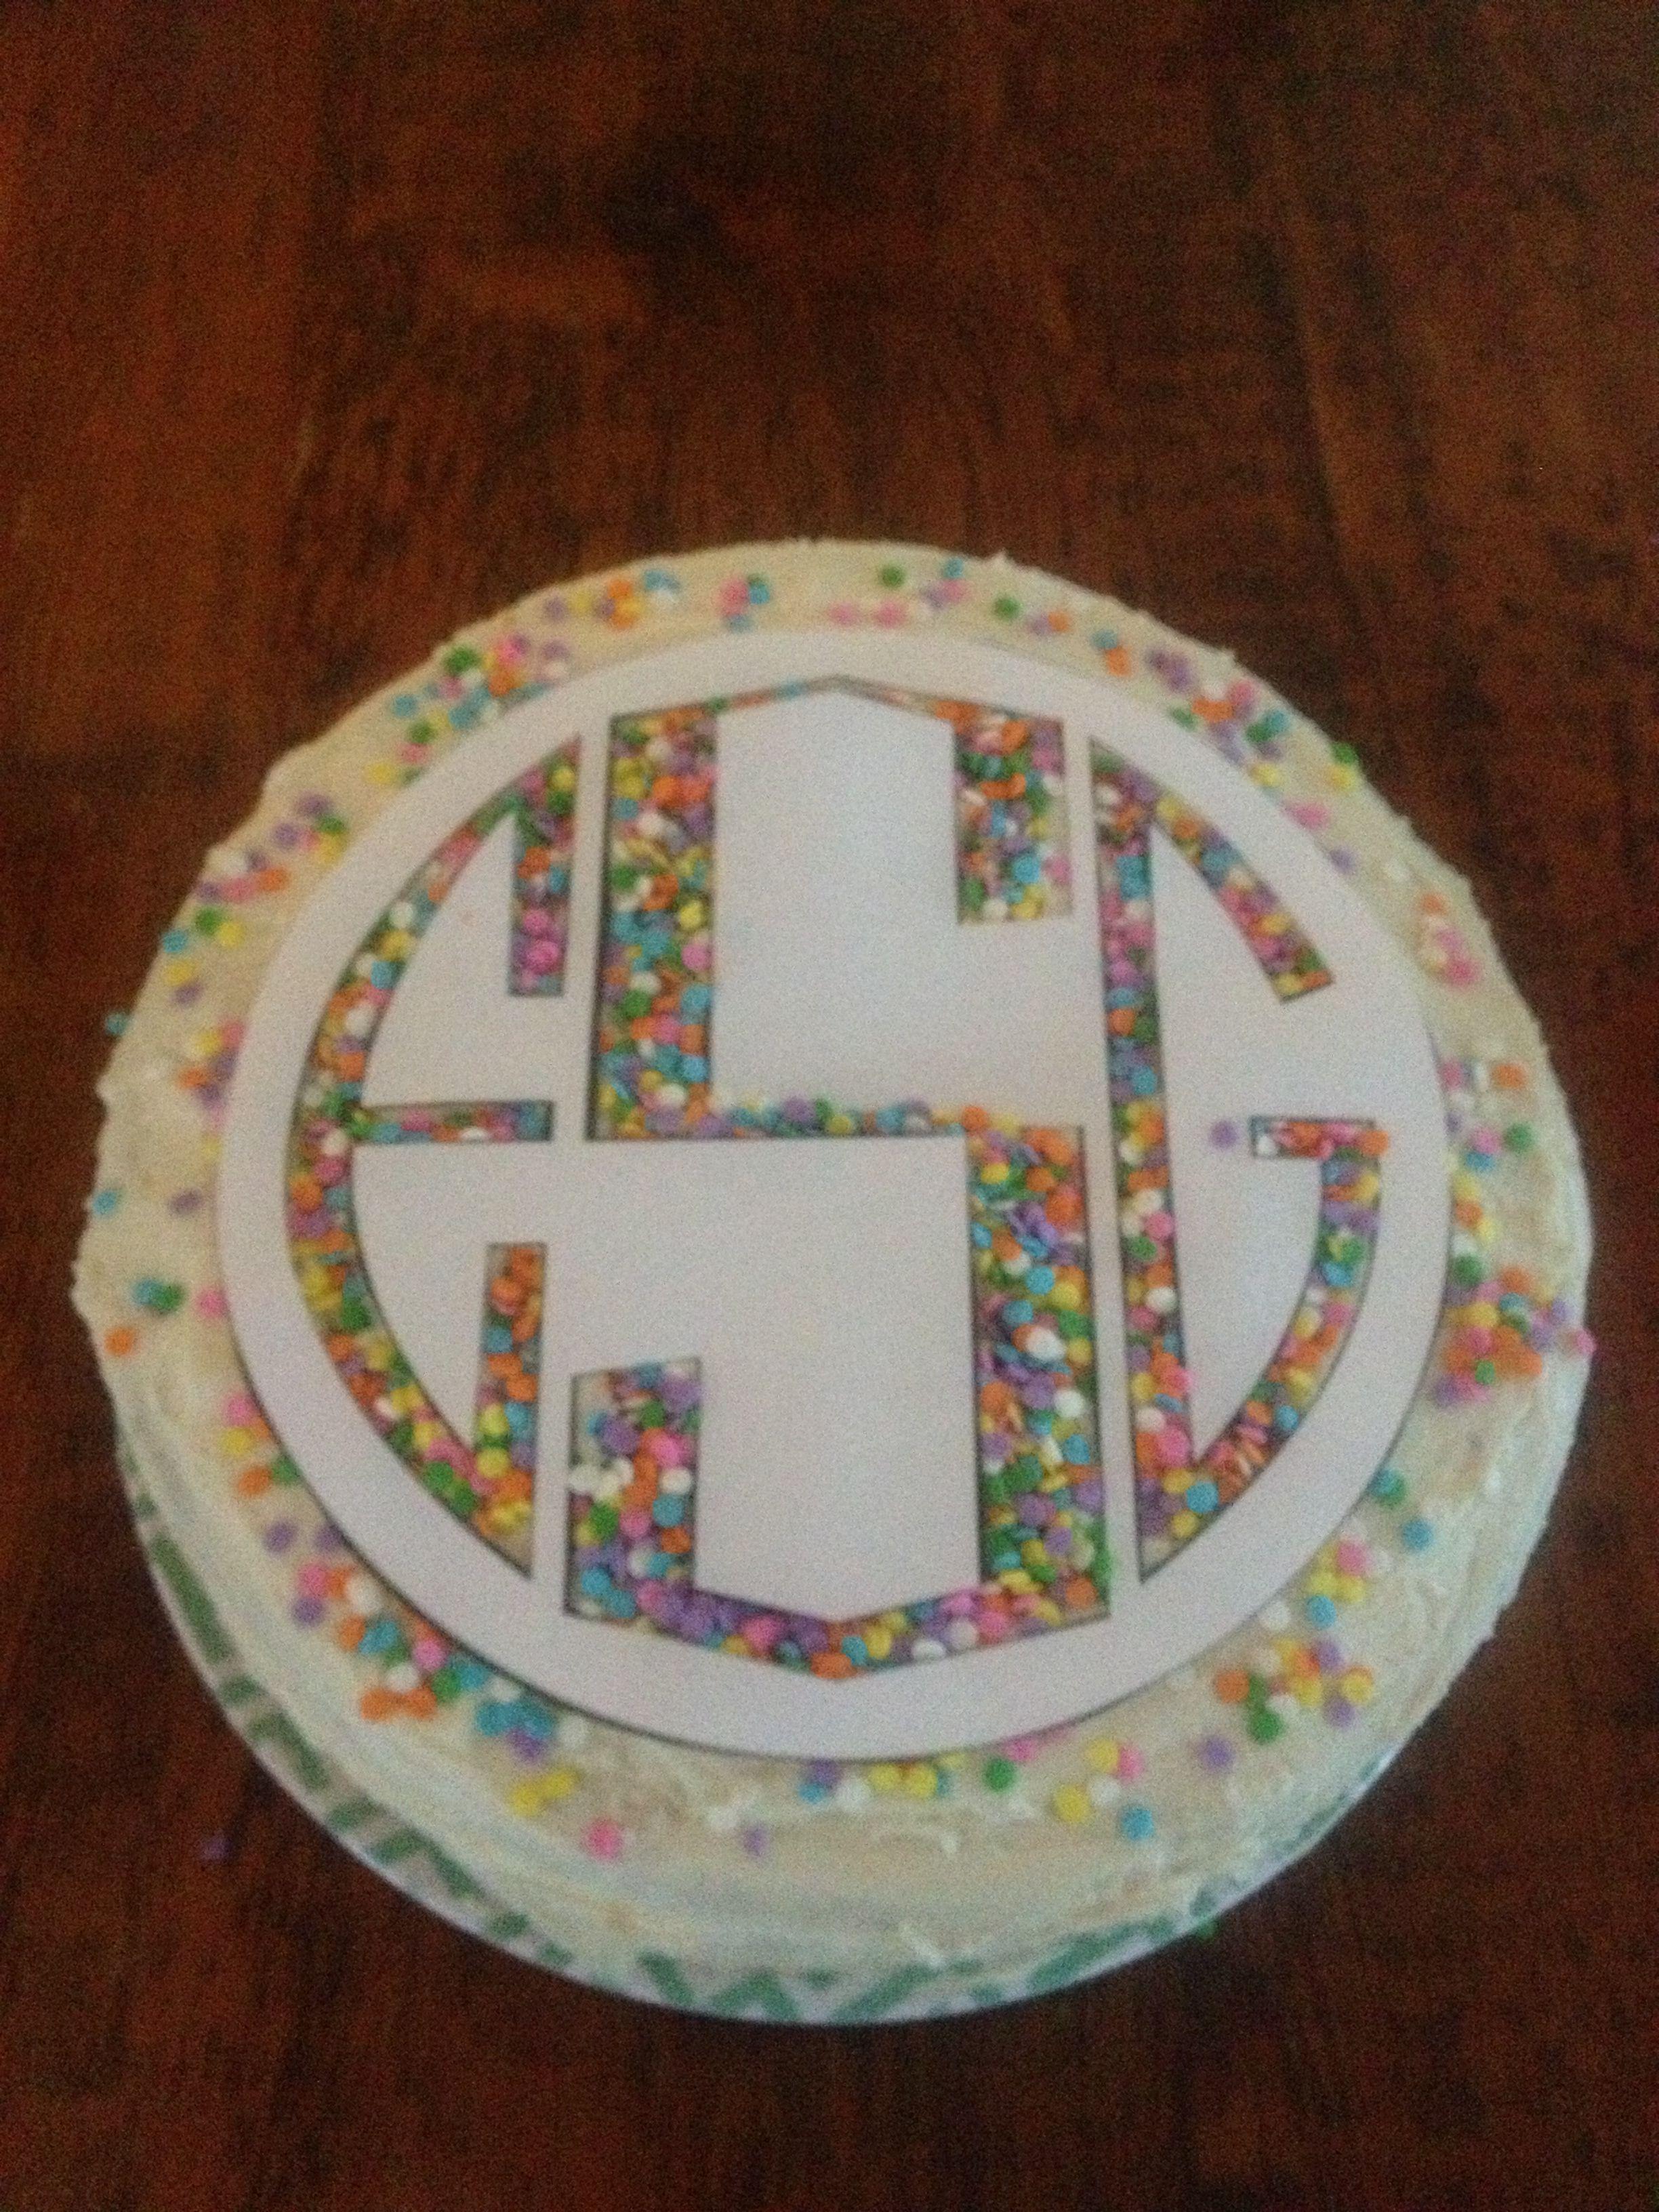 Ellas Monogramed DIY Birthday Cake Stencil I Love This Idea Would Edible Glitter